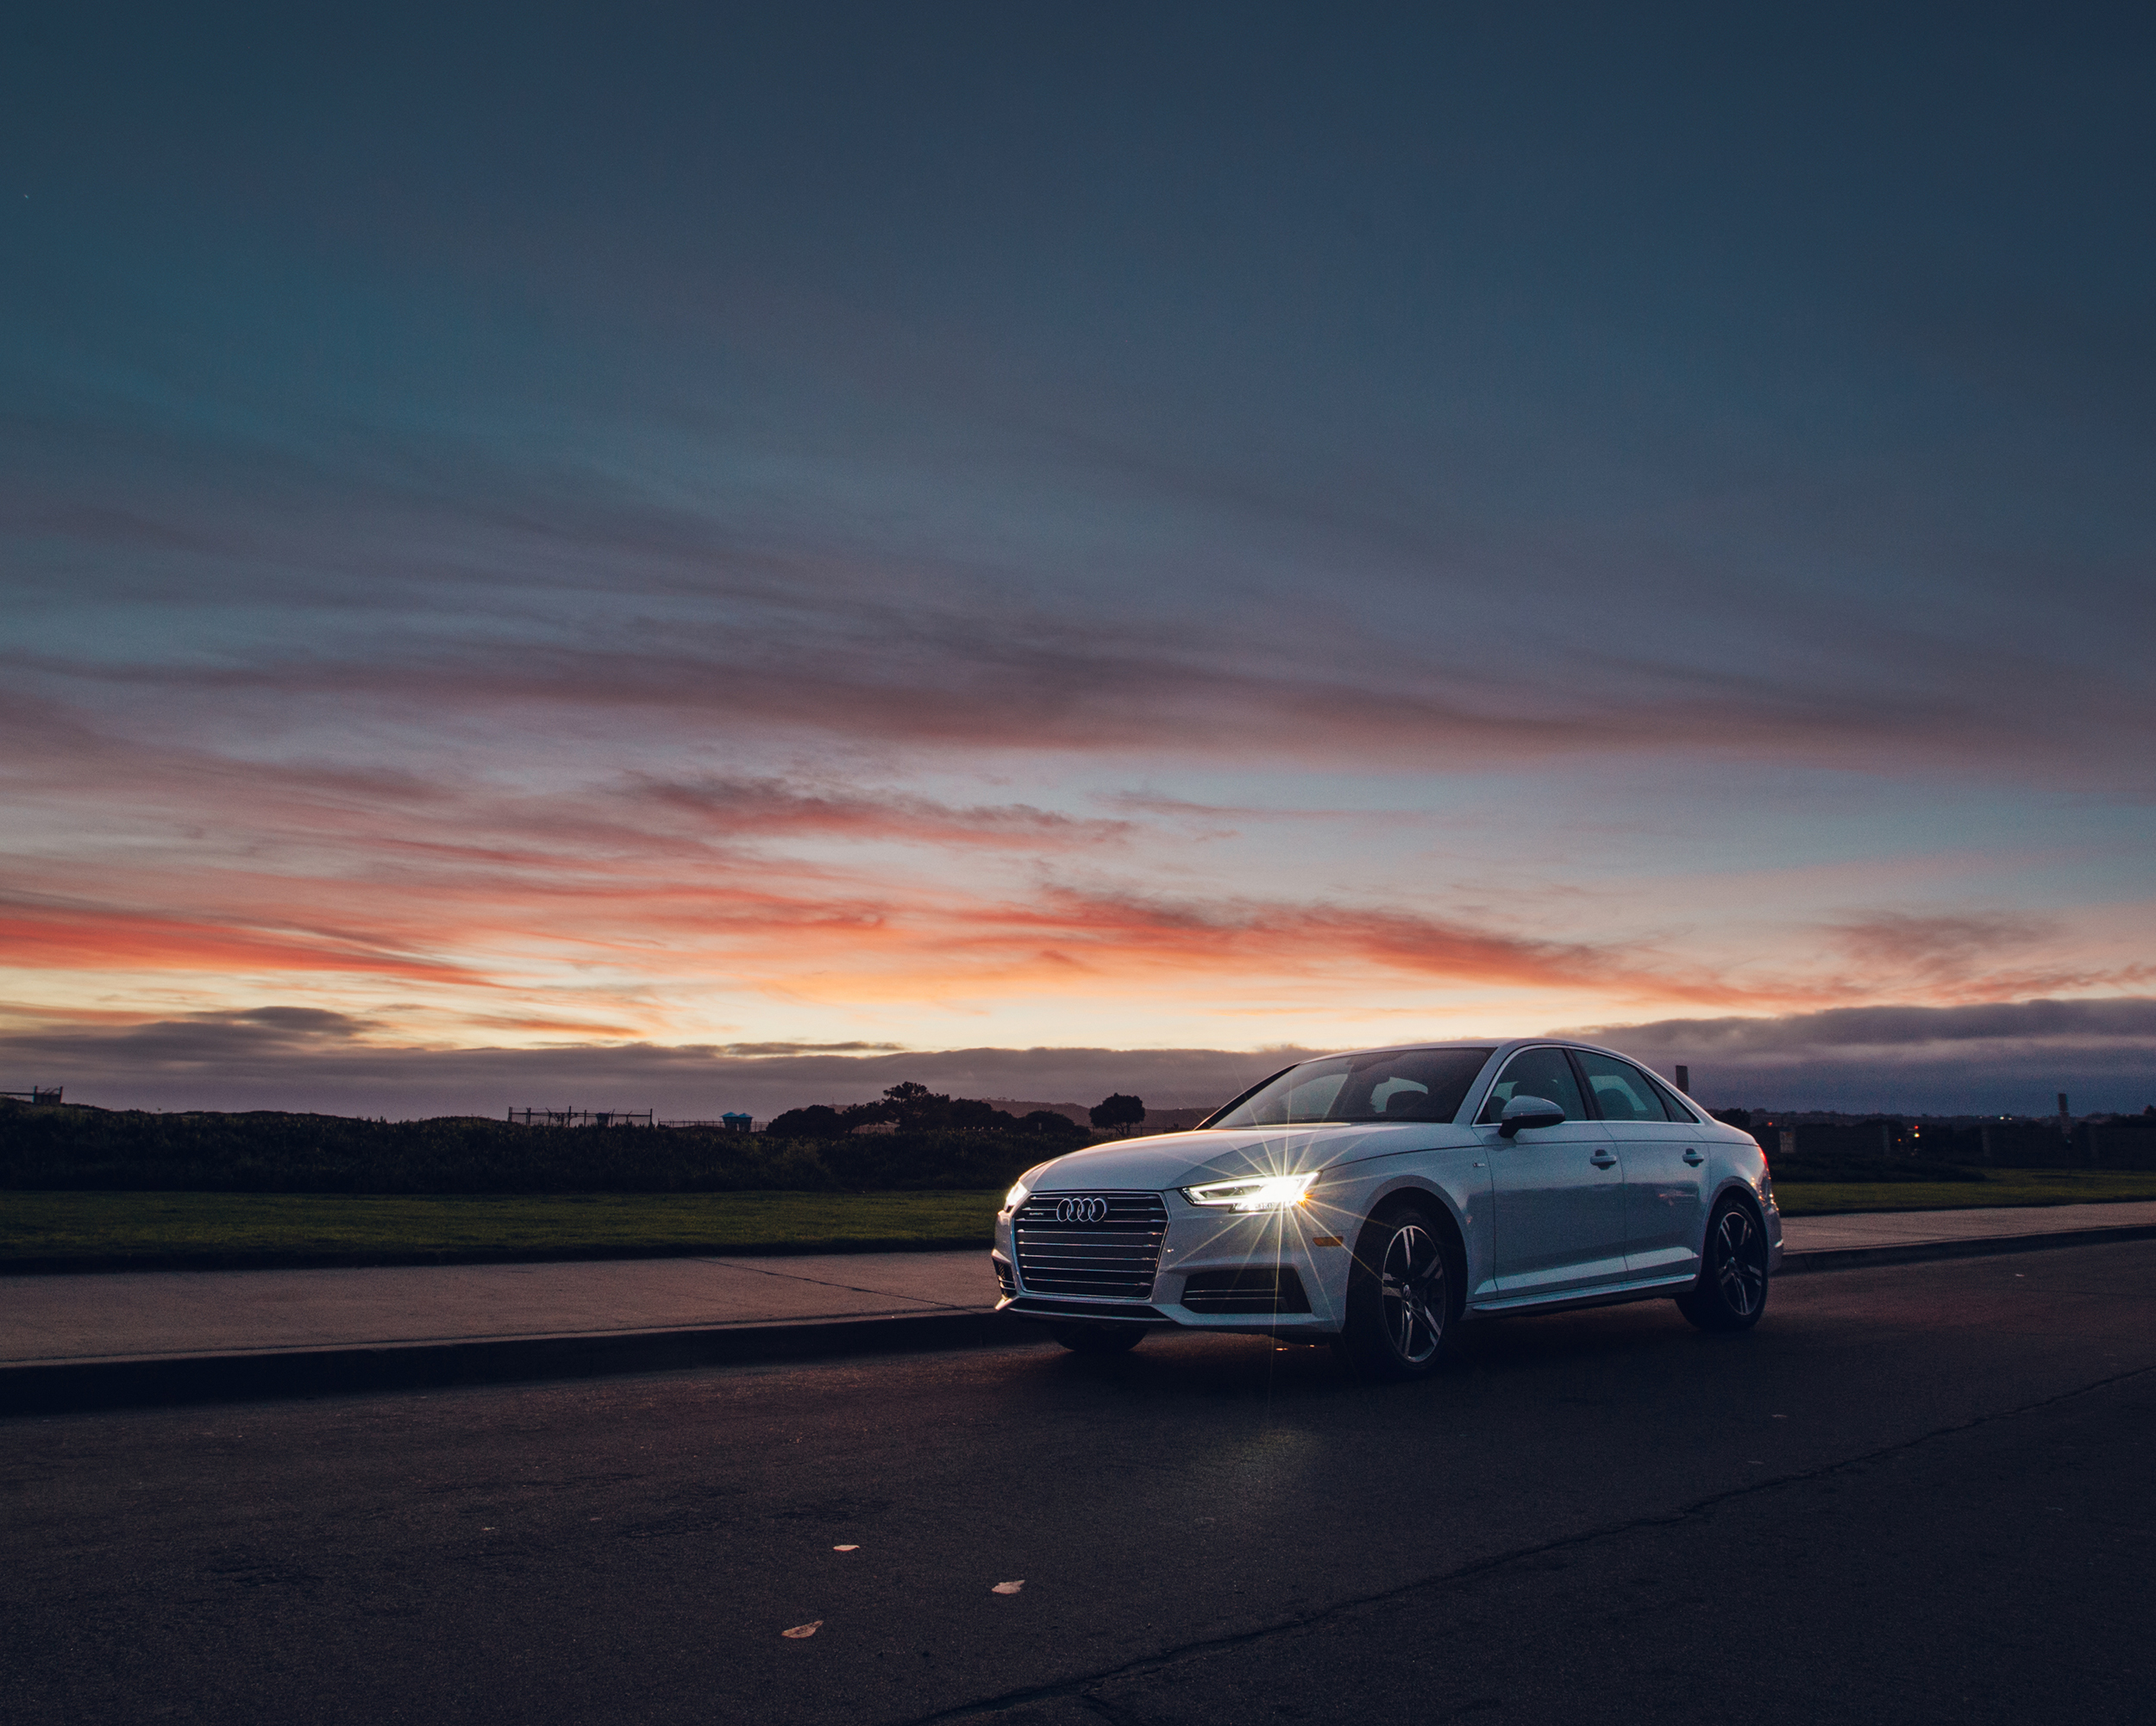 Audi_Web_Image_01.jpg